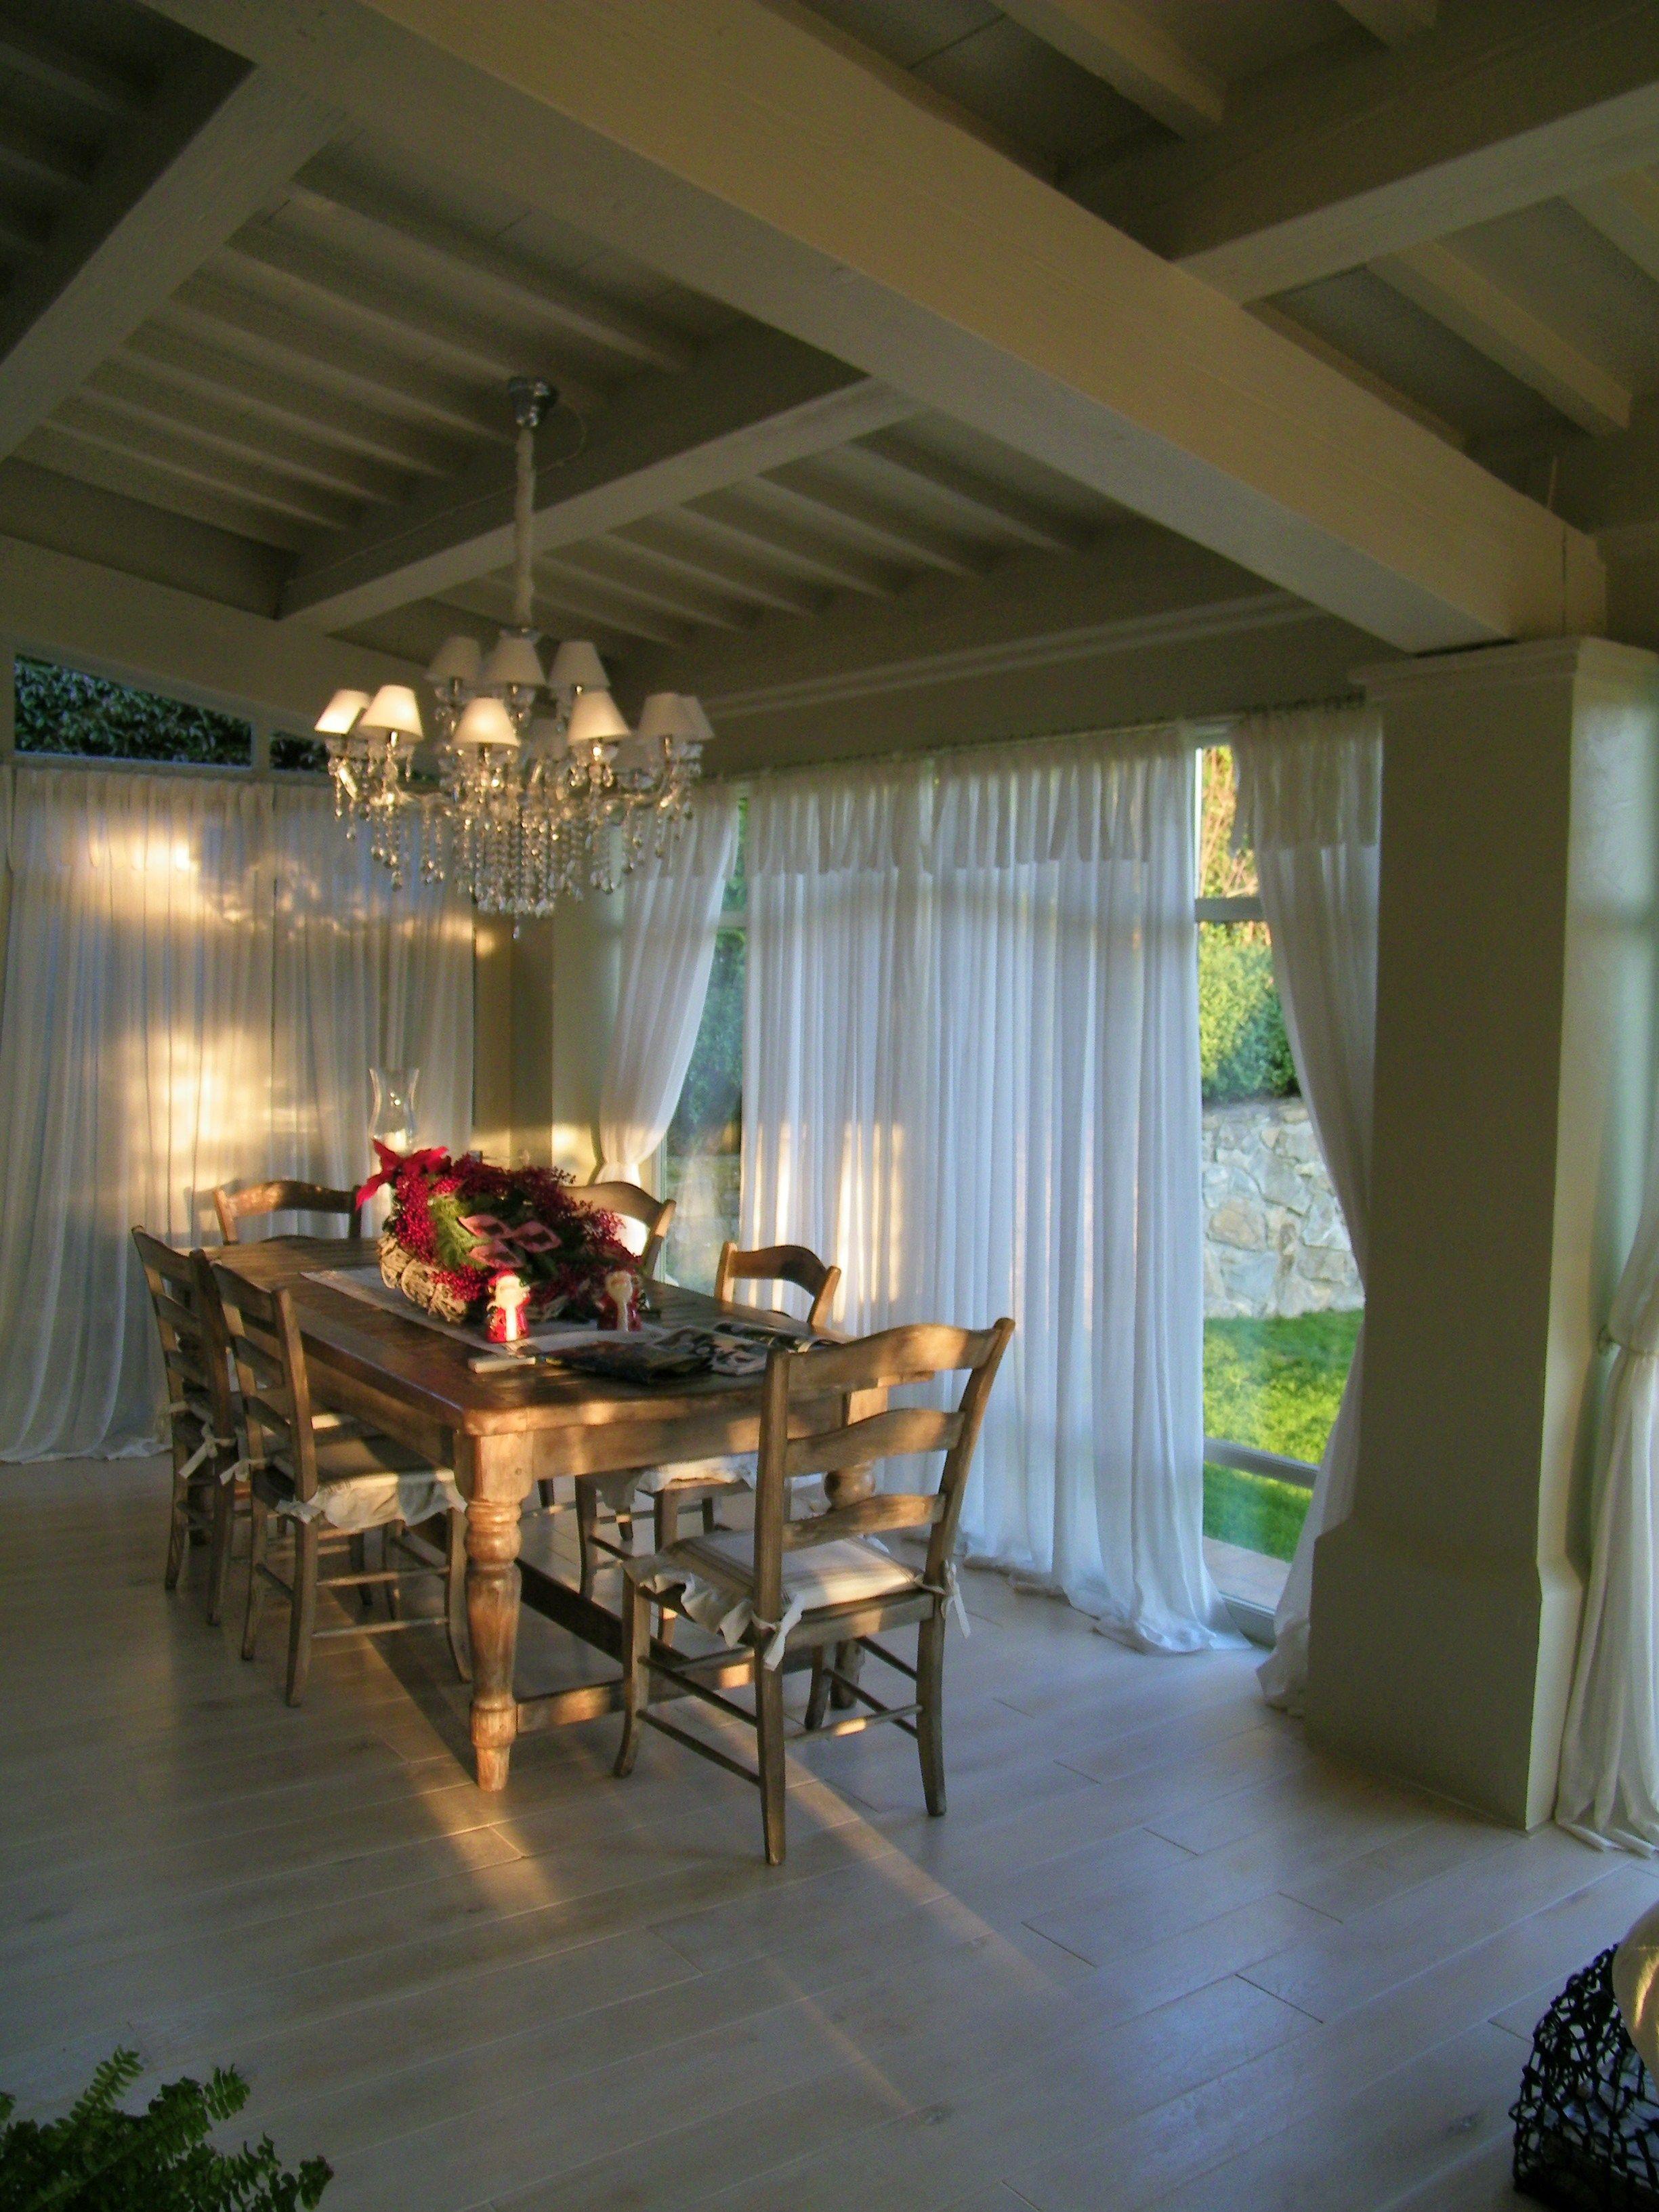 Giardino dinverno 6 by Garden House Lazzerini